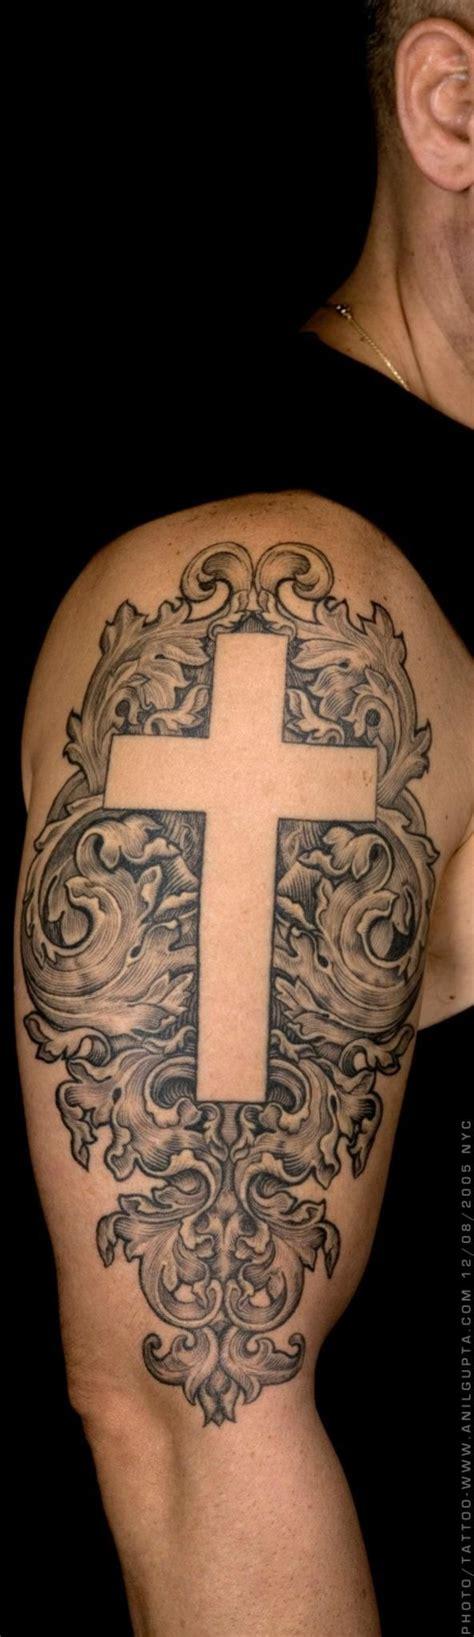 white ink cross tattoos best 25 white cross tattoos ideas on white